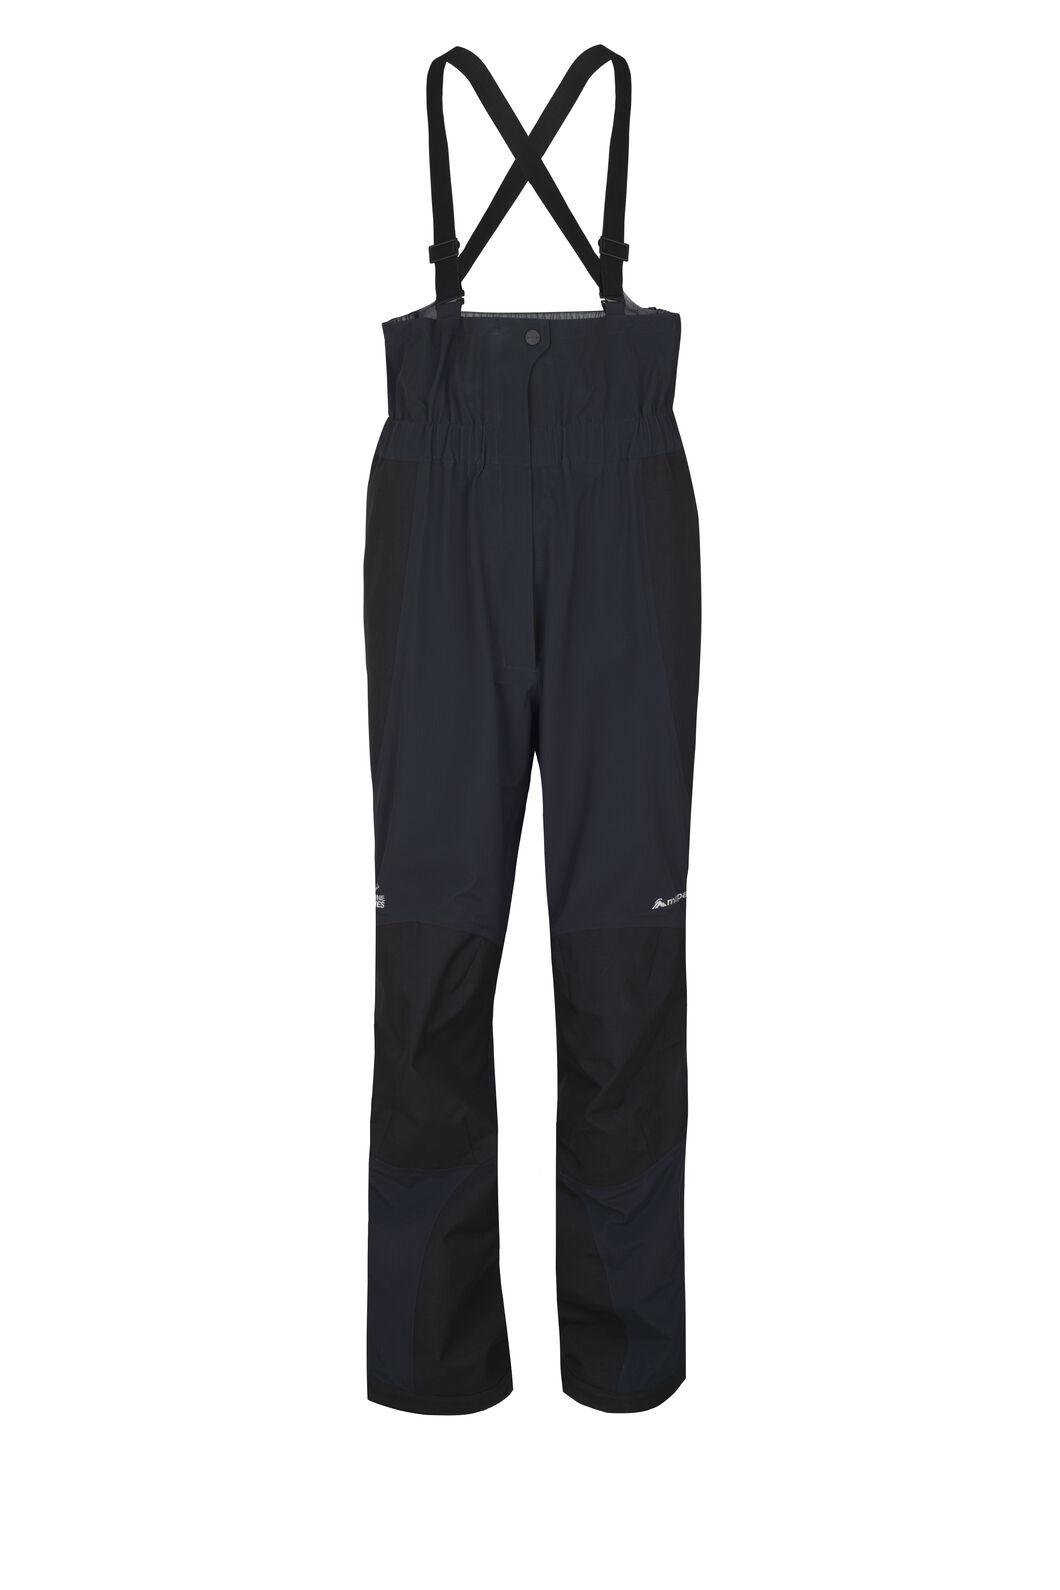 Macpac Barrier Bib Pertex® Rain Pants — Men's, Black, hi-res